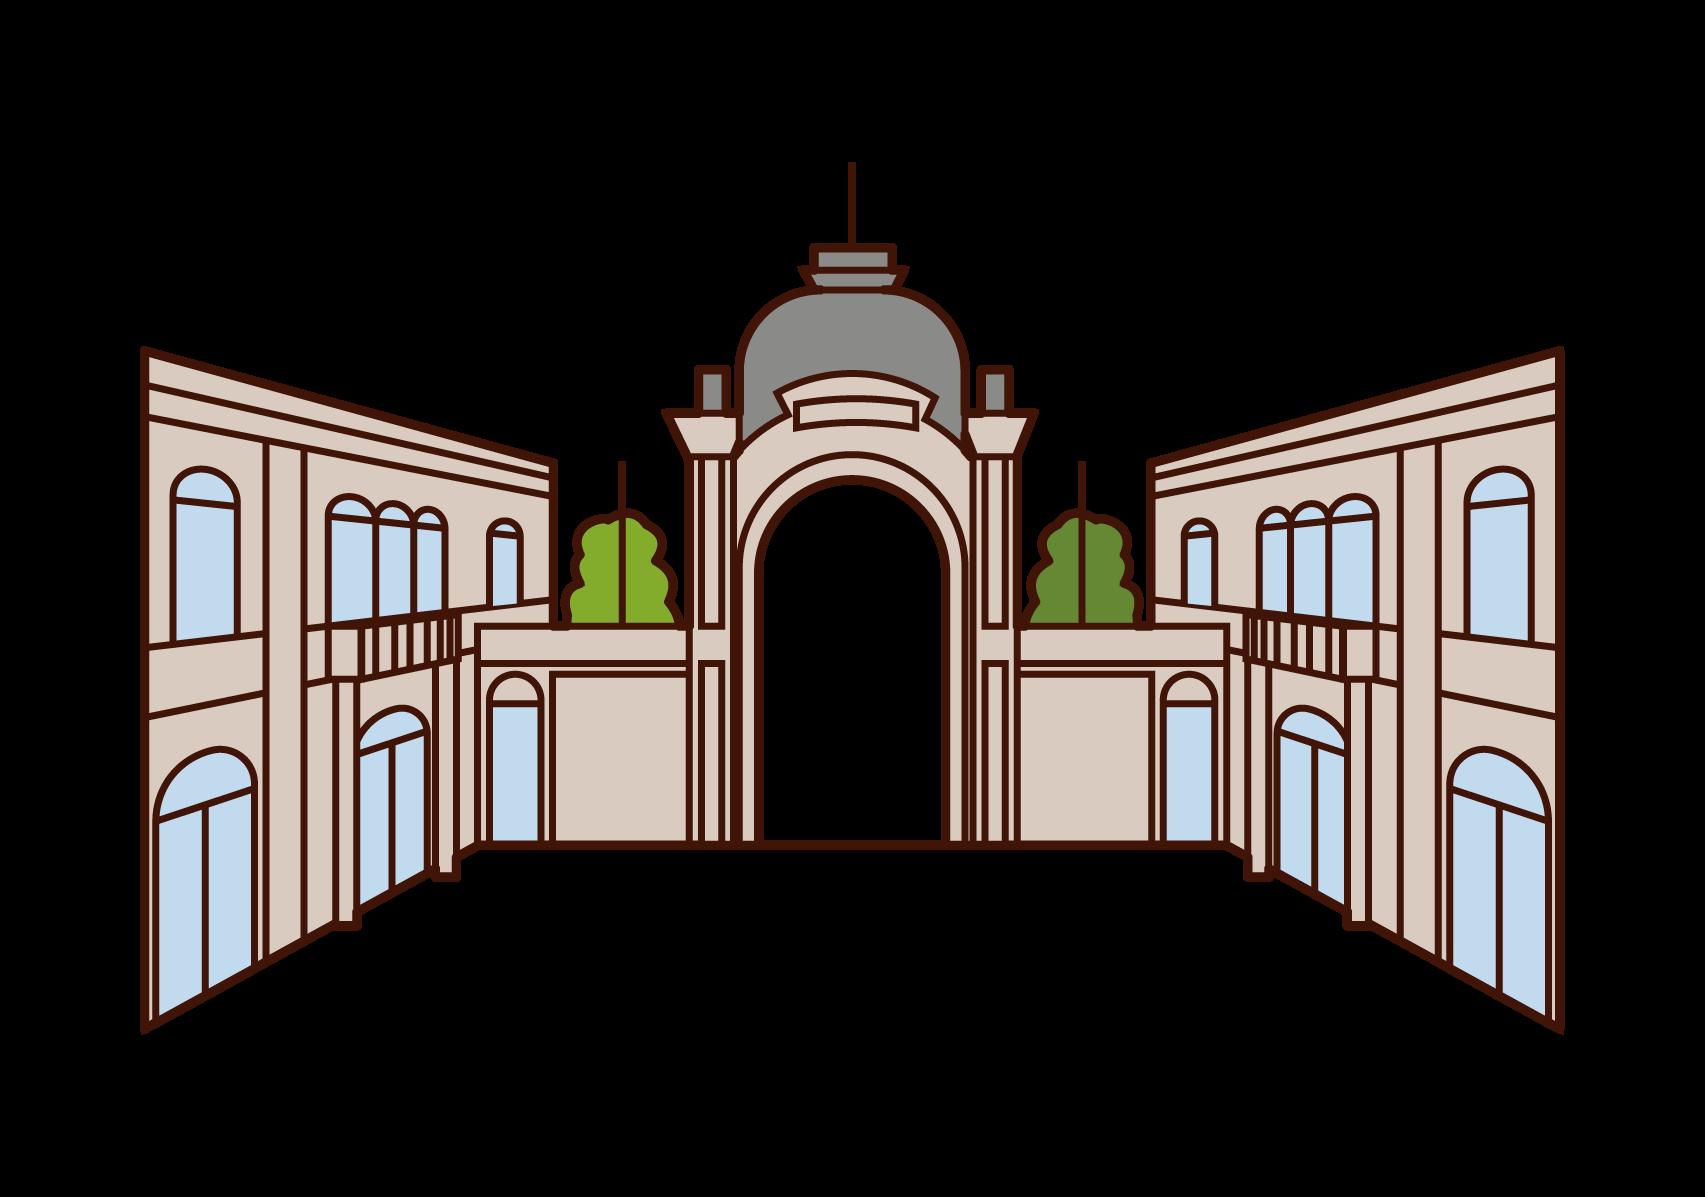 Illustrations of Tivoli Park